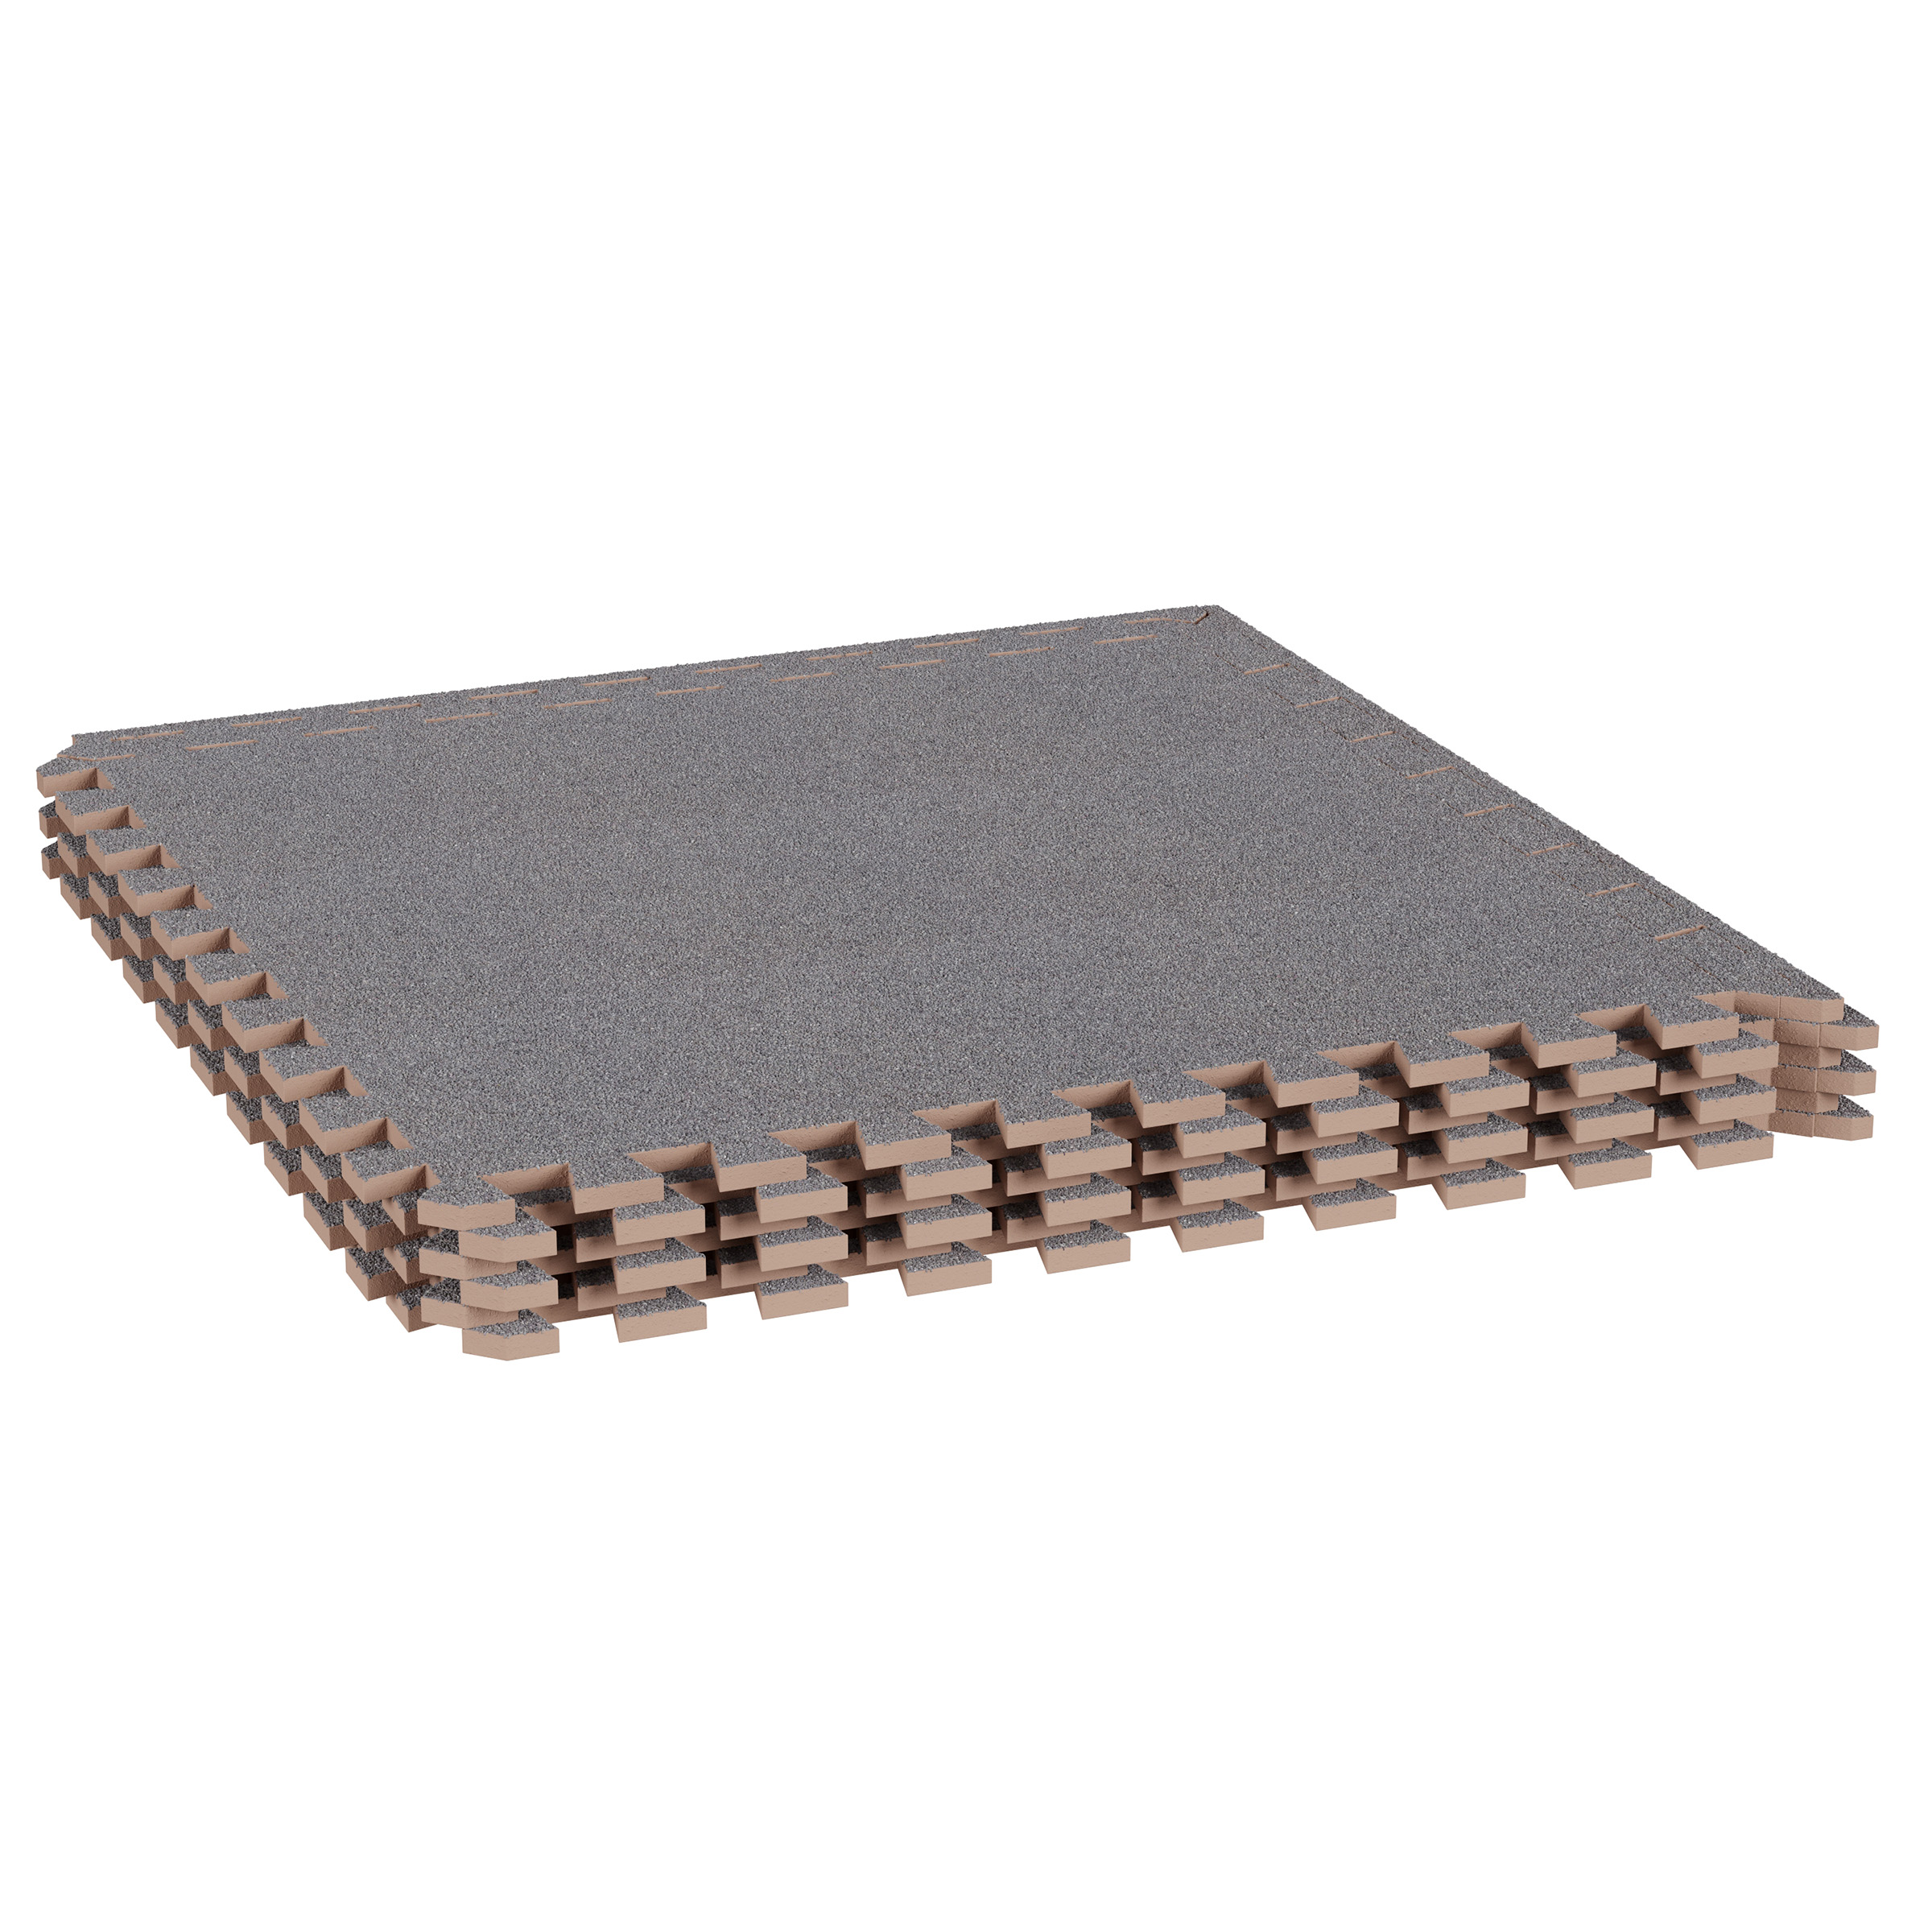 Image of: Foam Mat Floor Tiles Interlocking Eva Foam Padding With Soft Carpet Top For Exercise Yoga Kids Playroom Garage Basement 6pc Set By Stalwart Gray Walmart Com Walmart Com